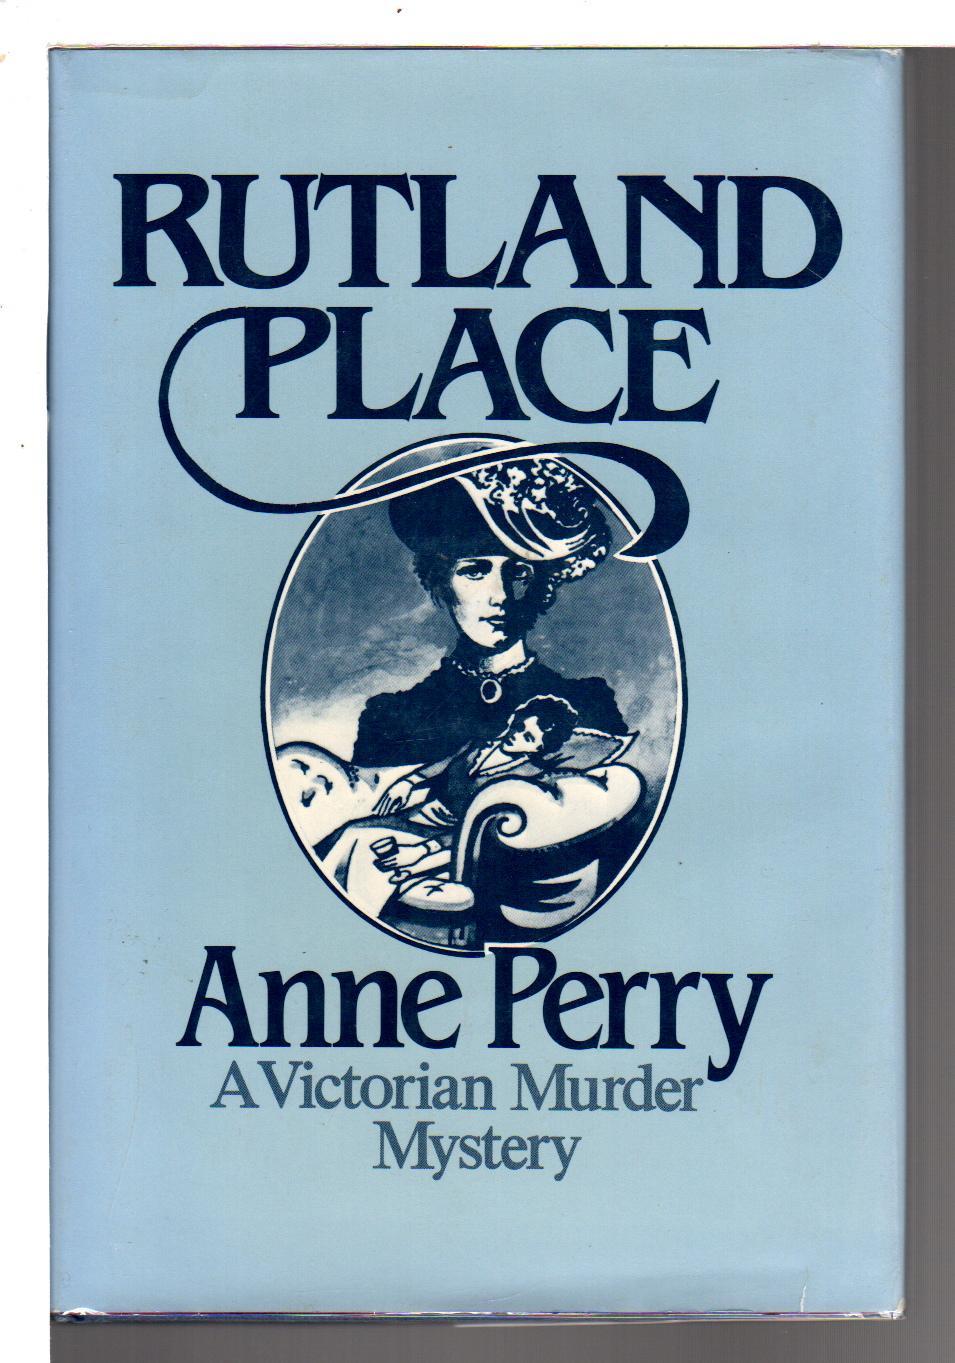 RUTLAND PLACE.: Perry, Anne.